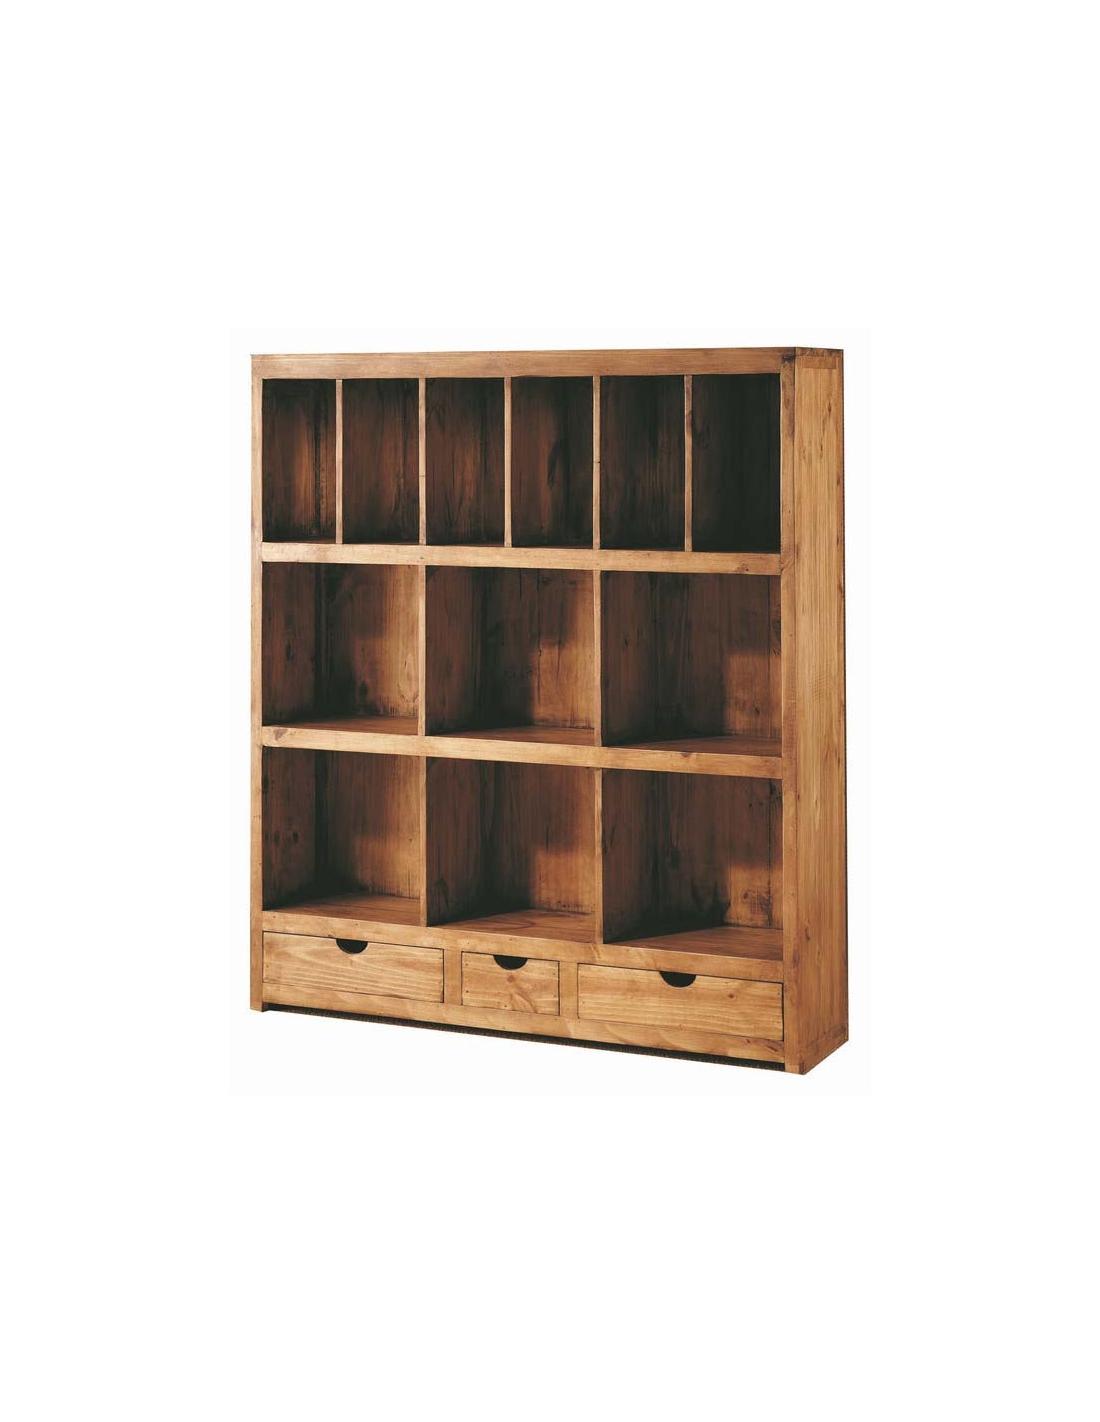 Comprar librer a modular madera estilo rustico 134 cm - Libreria de madera ...